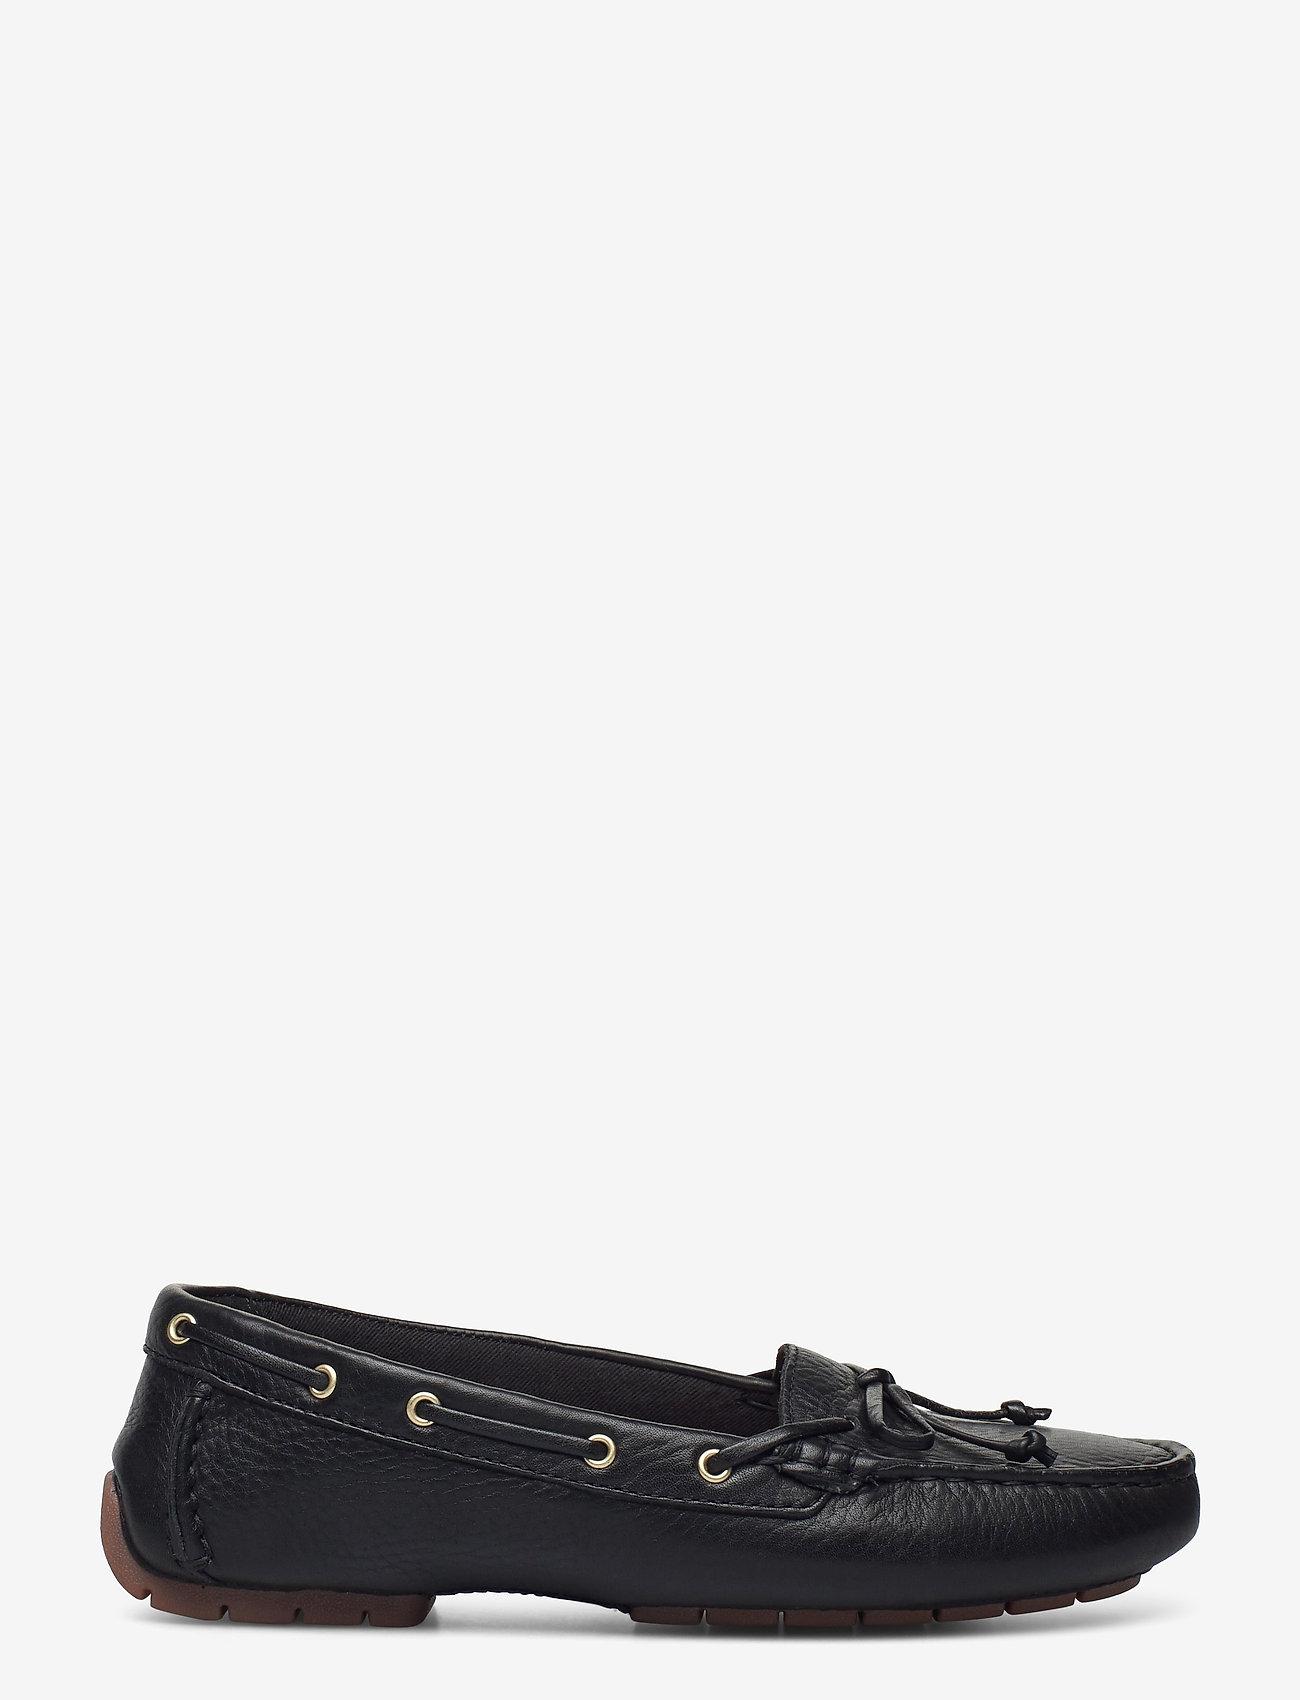 Clarks - C Mocc Boat - loafers - black leather - 1